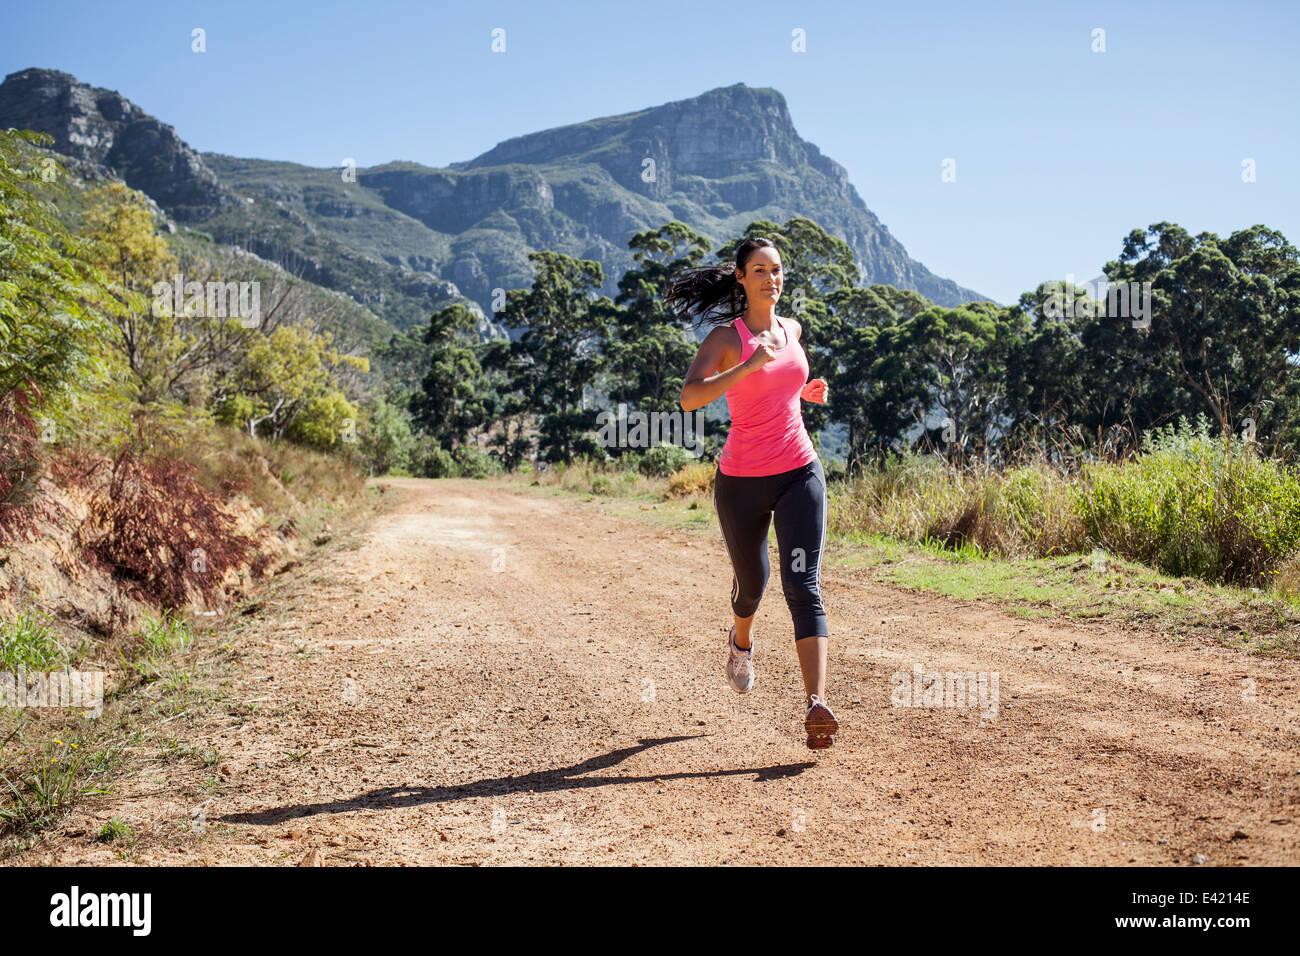 Junge Frau im Wald joggen Stockbild